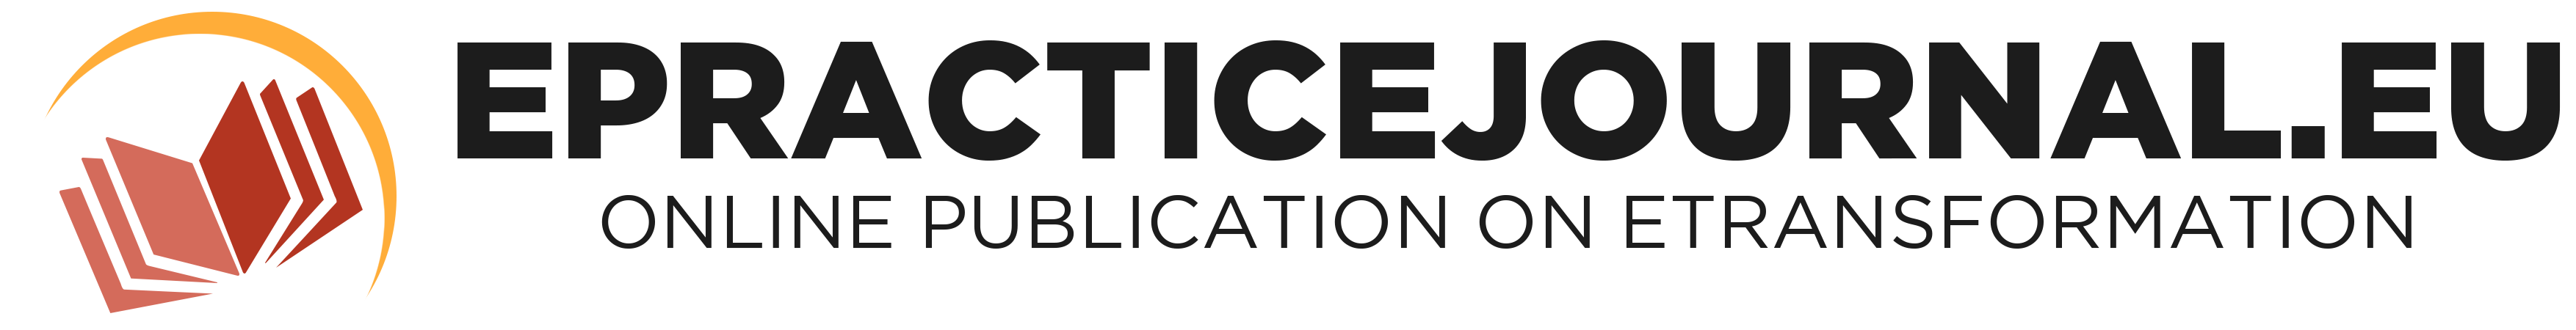 logo epractice